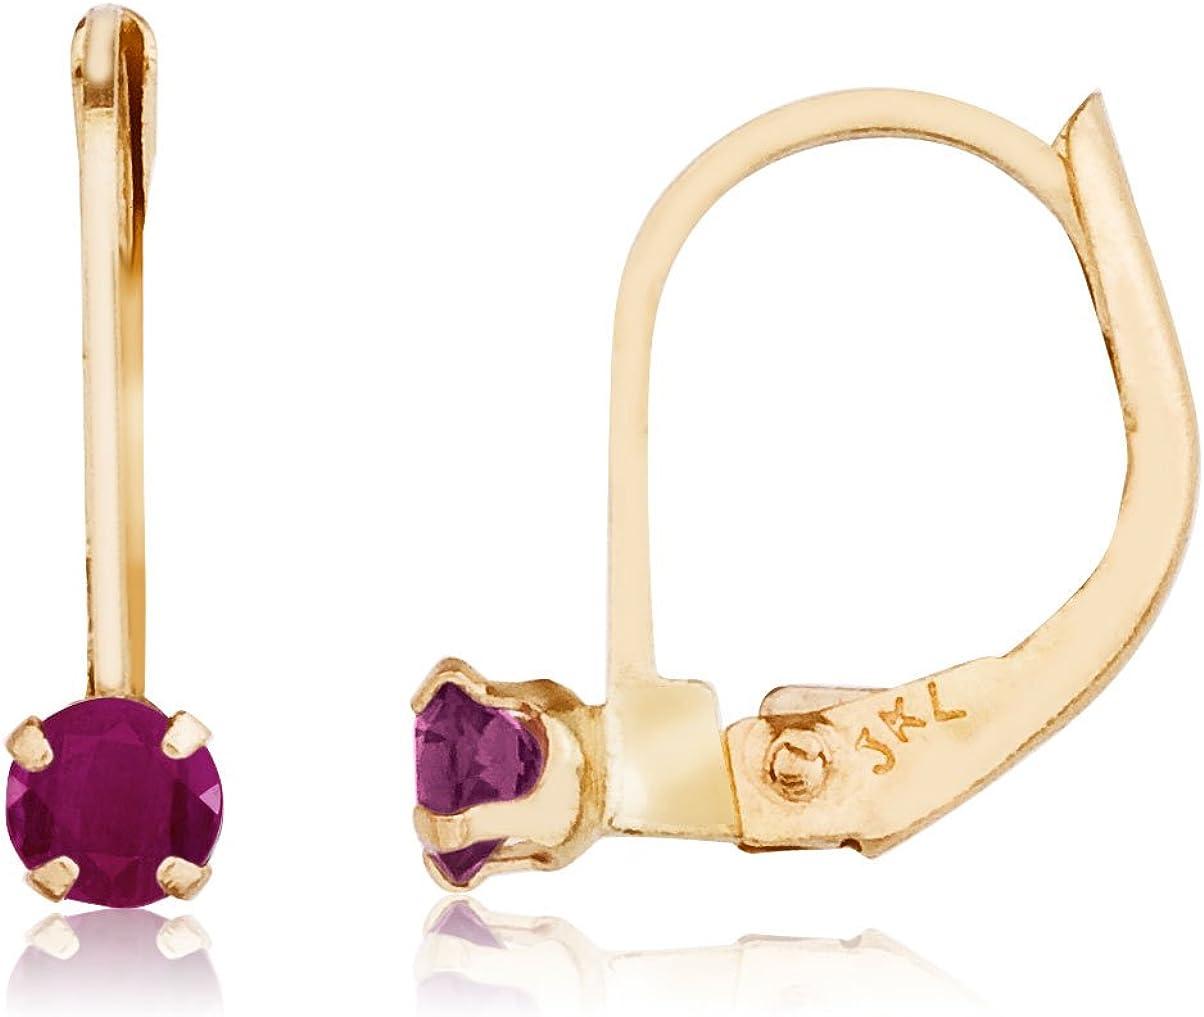 14k Yellow Gold Petite Ruby Leverback Earrings